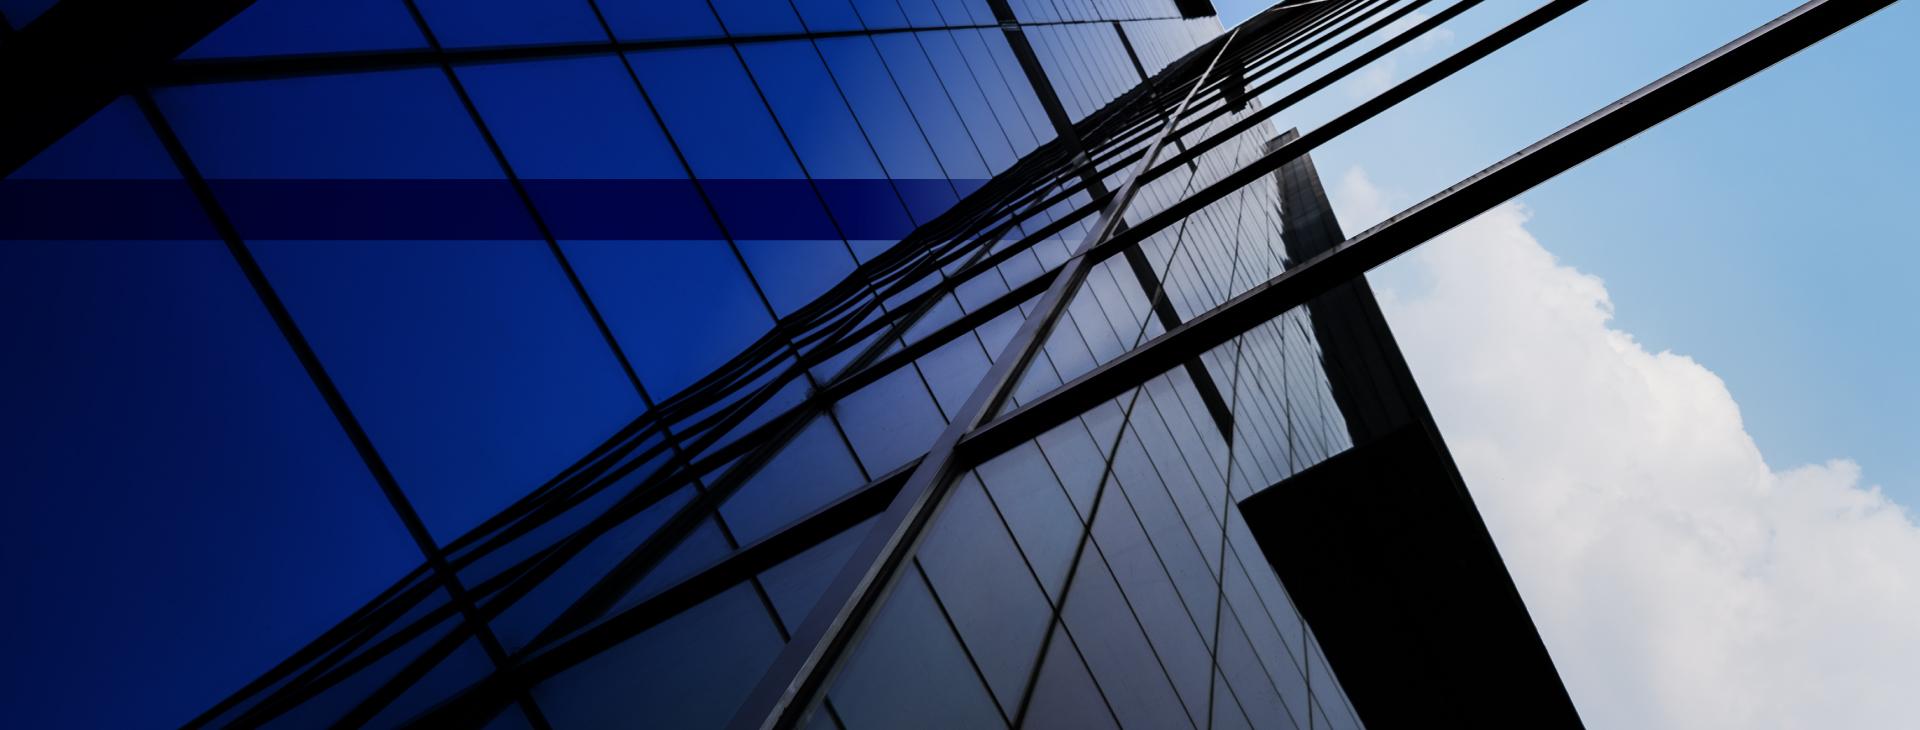 Máster BIM Management Internacional (Oficial de Autodesk) Presencial